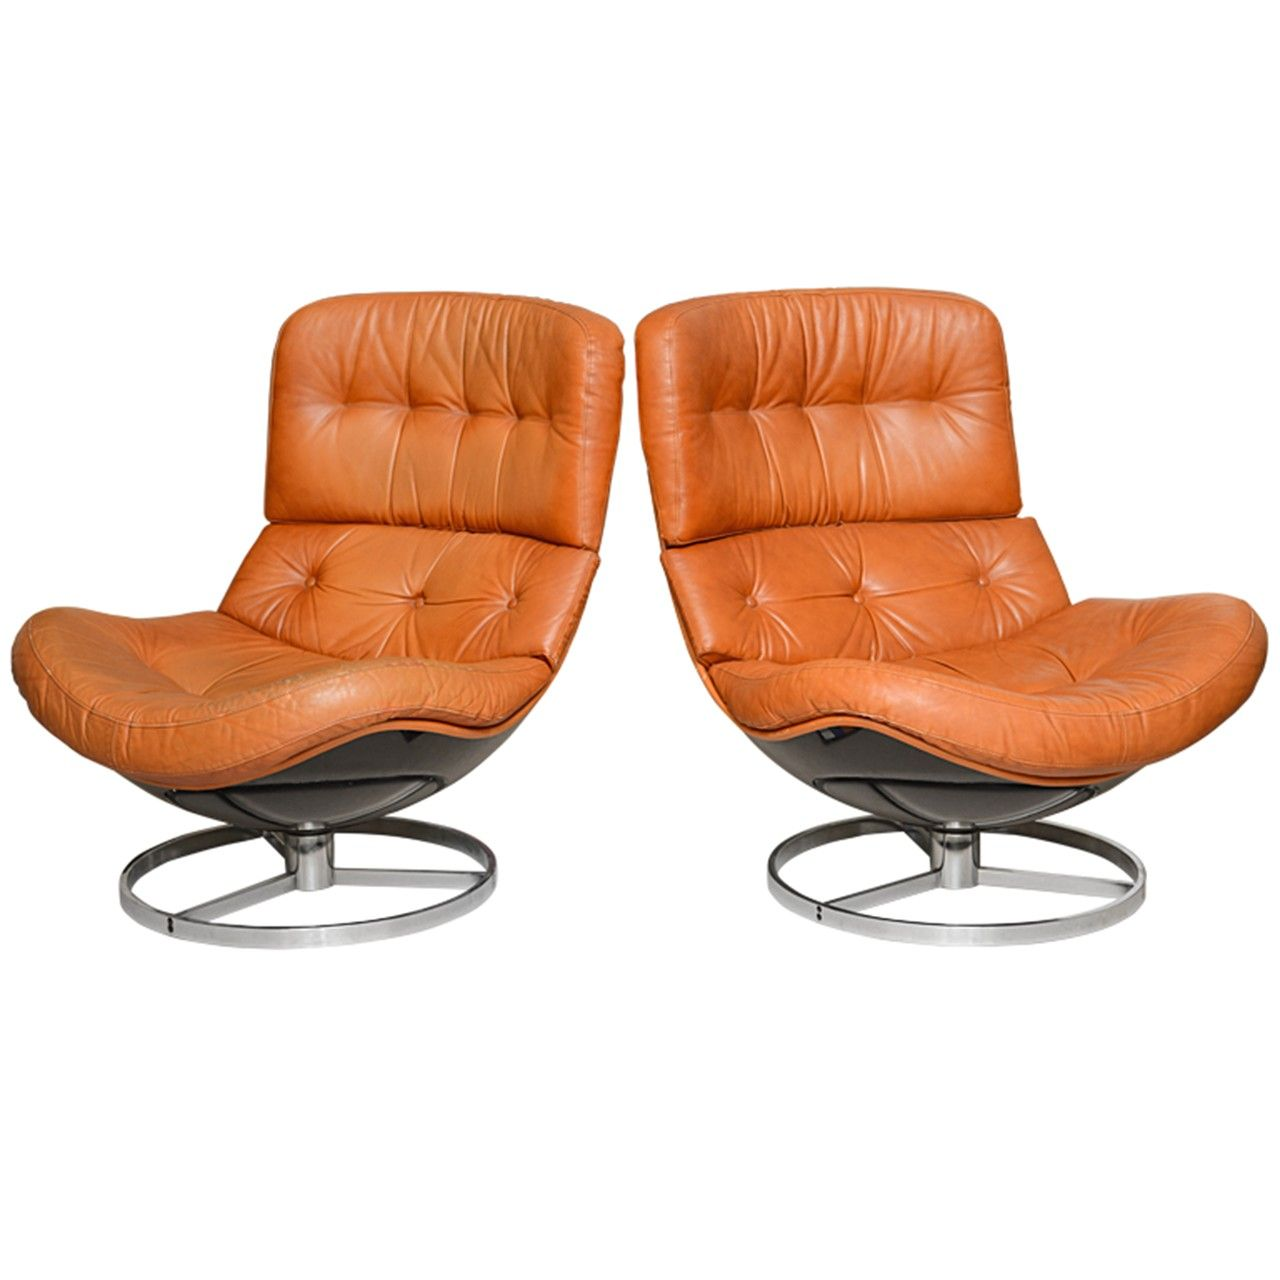 Admirable Pair Of Unusual Milo Baughman Swivel Chairs For The Home Creativecarmelina Interior Chair Design Creativecarmelinacom